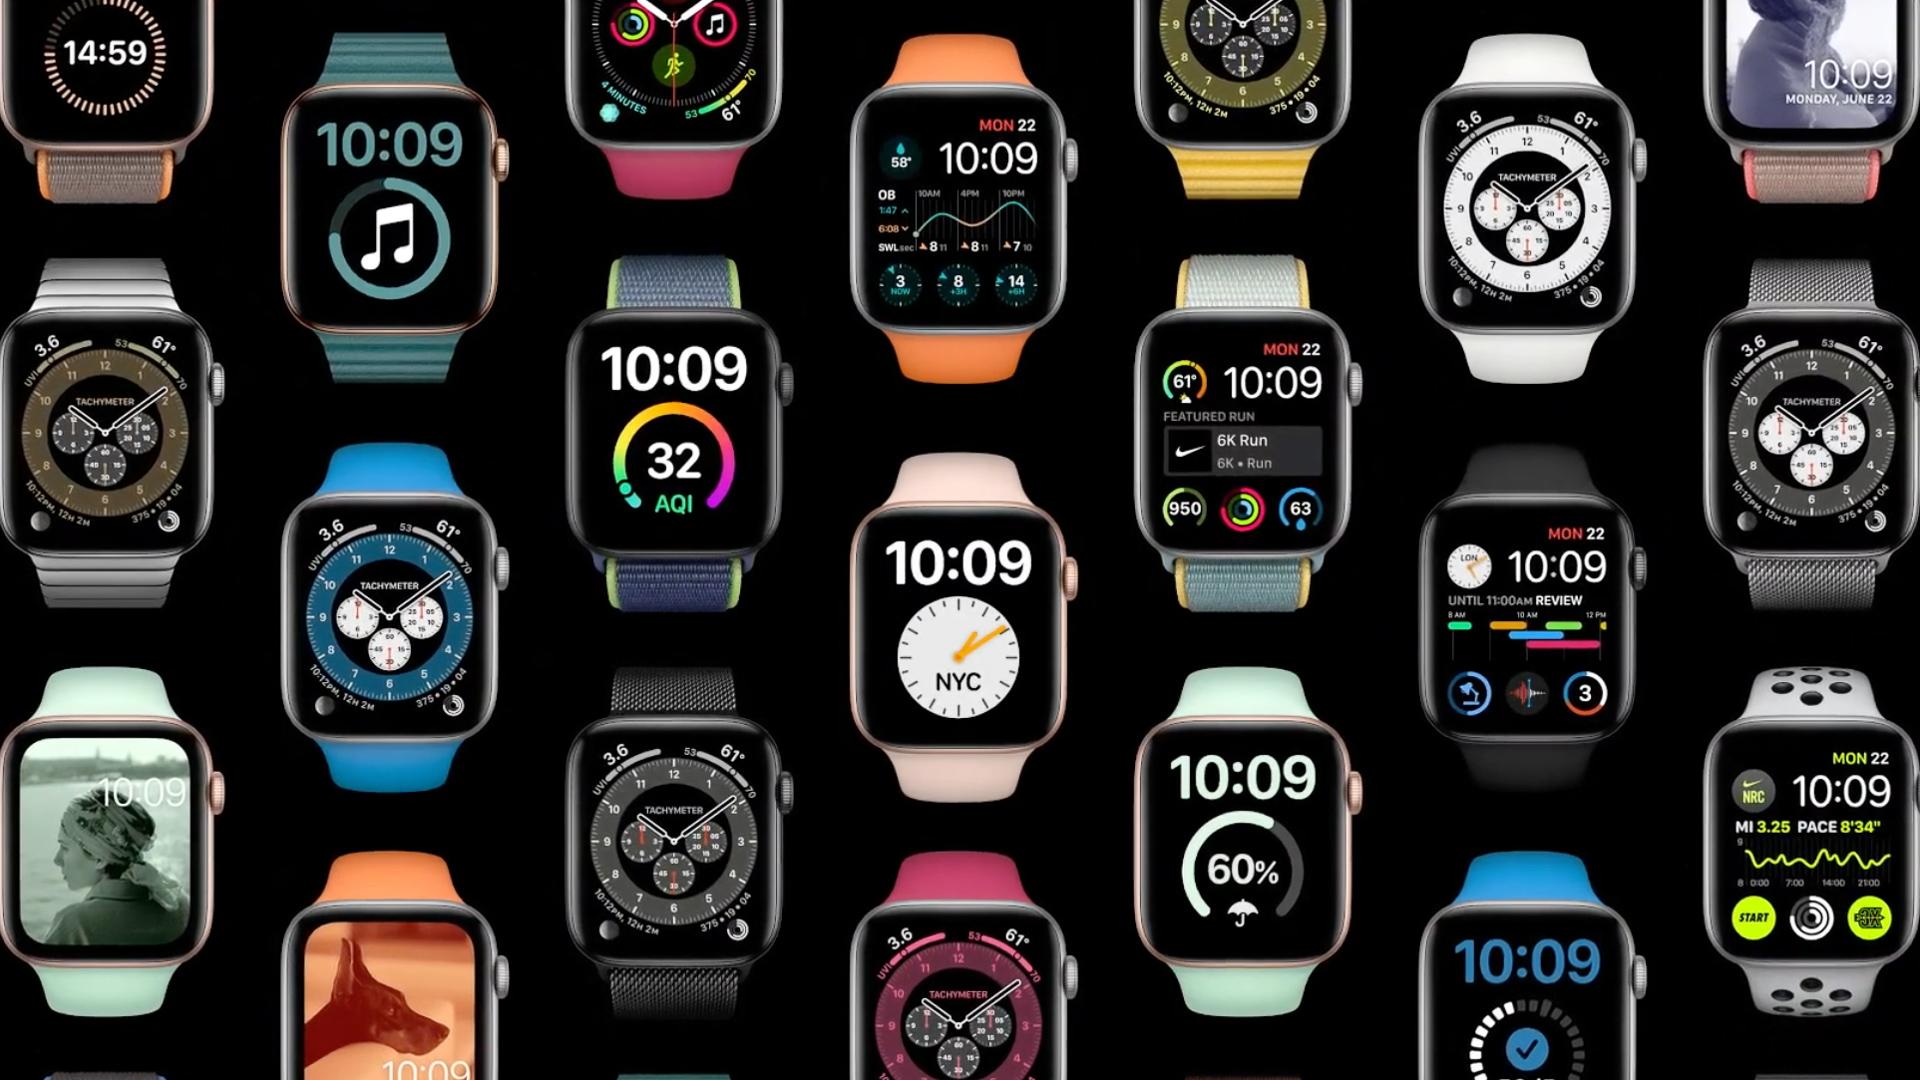 Apple WWDC 2020 watchOS faces